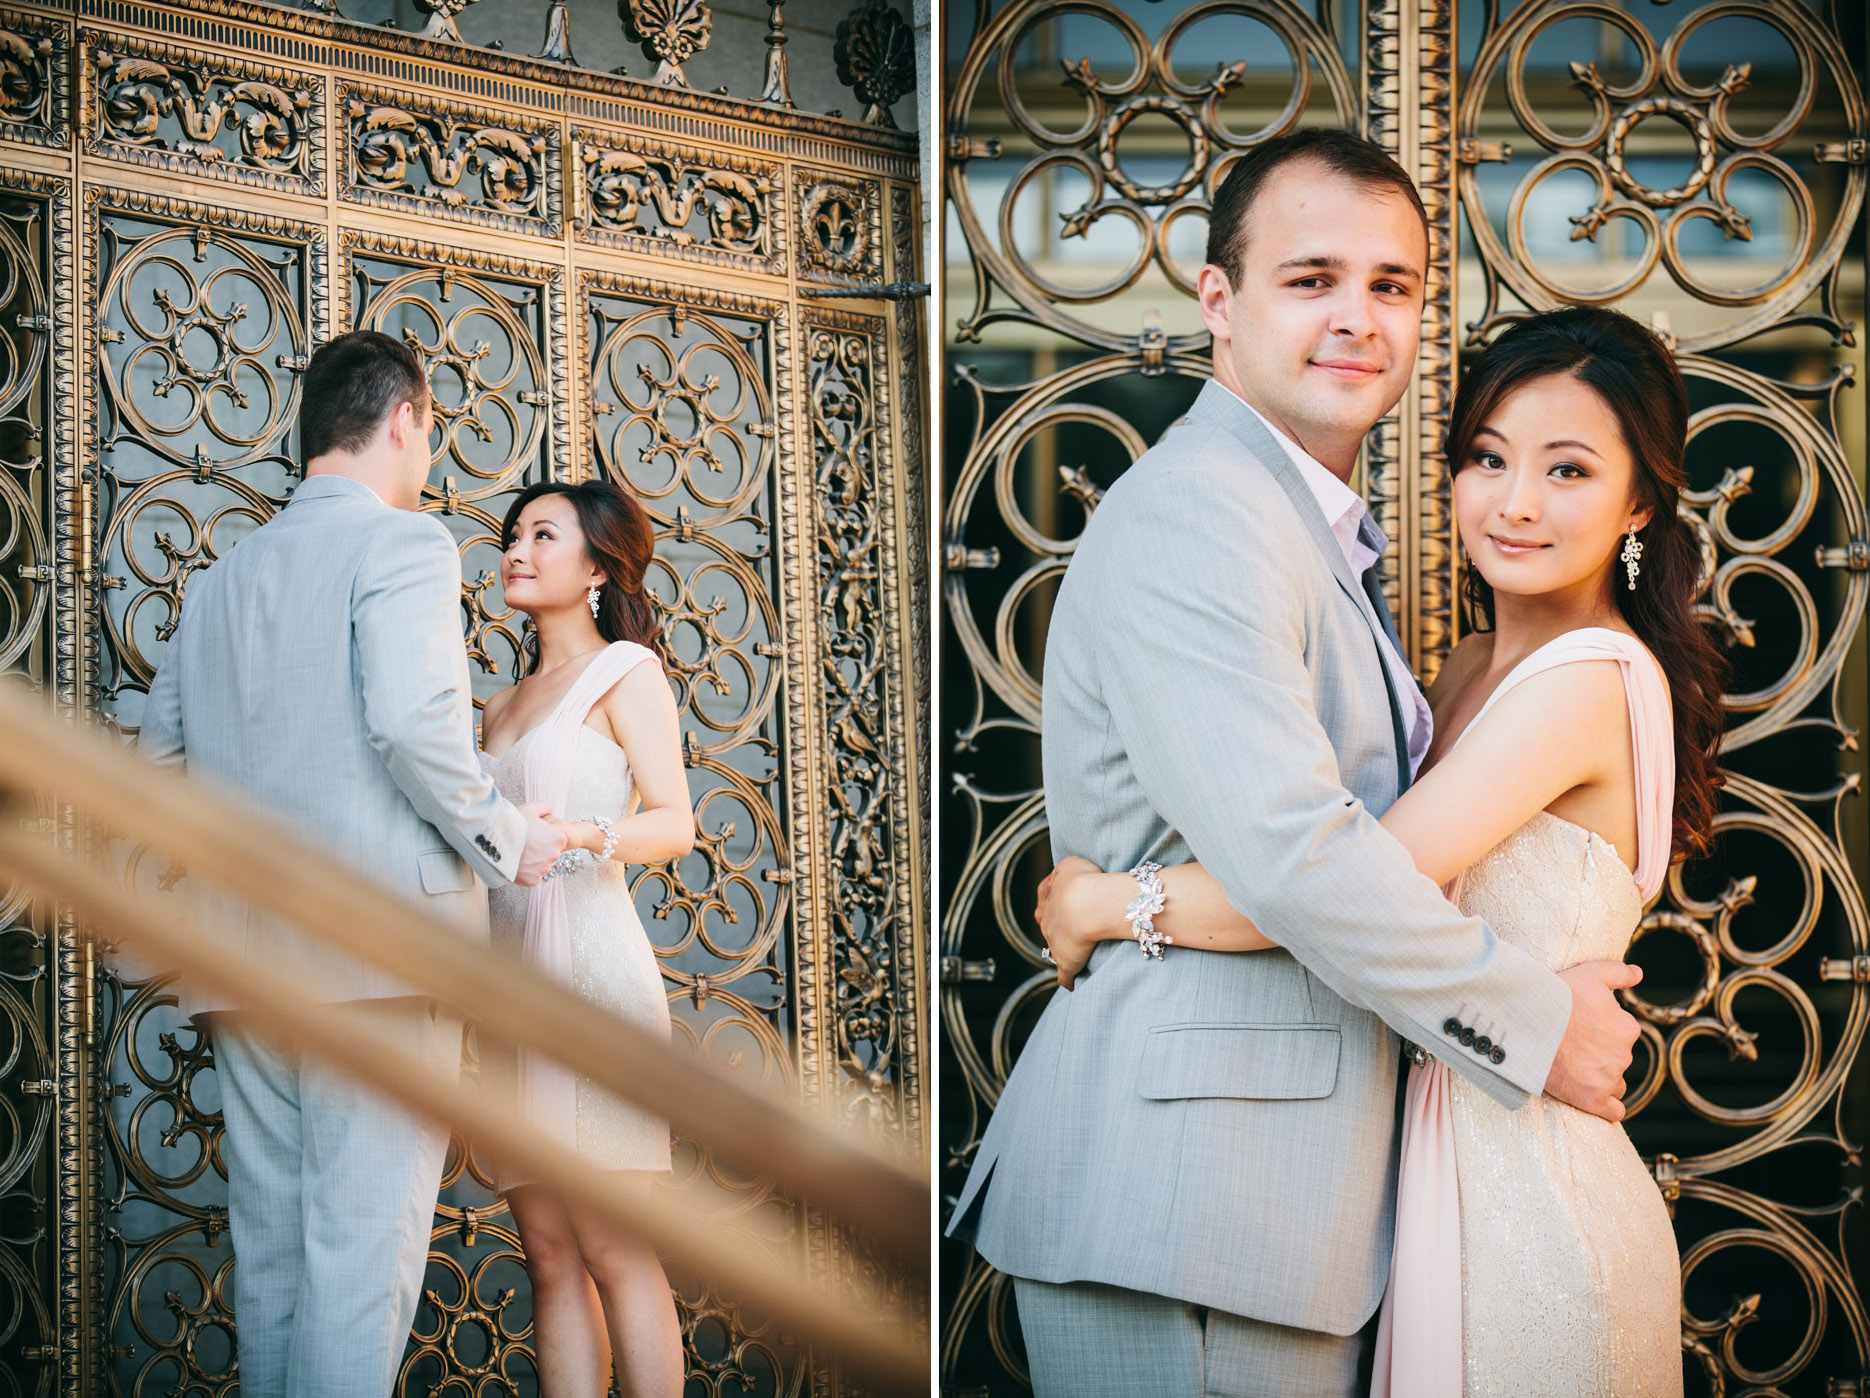 St-Louis-Wedding-Photography-1006-copy1.jpg